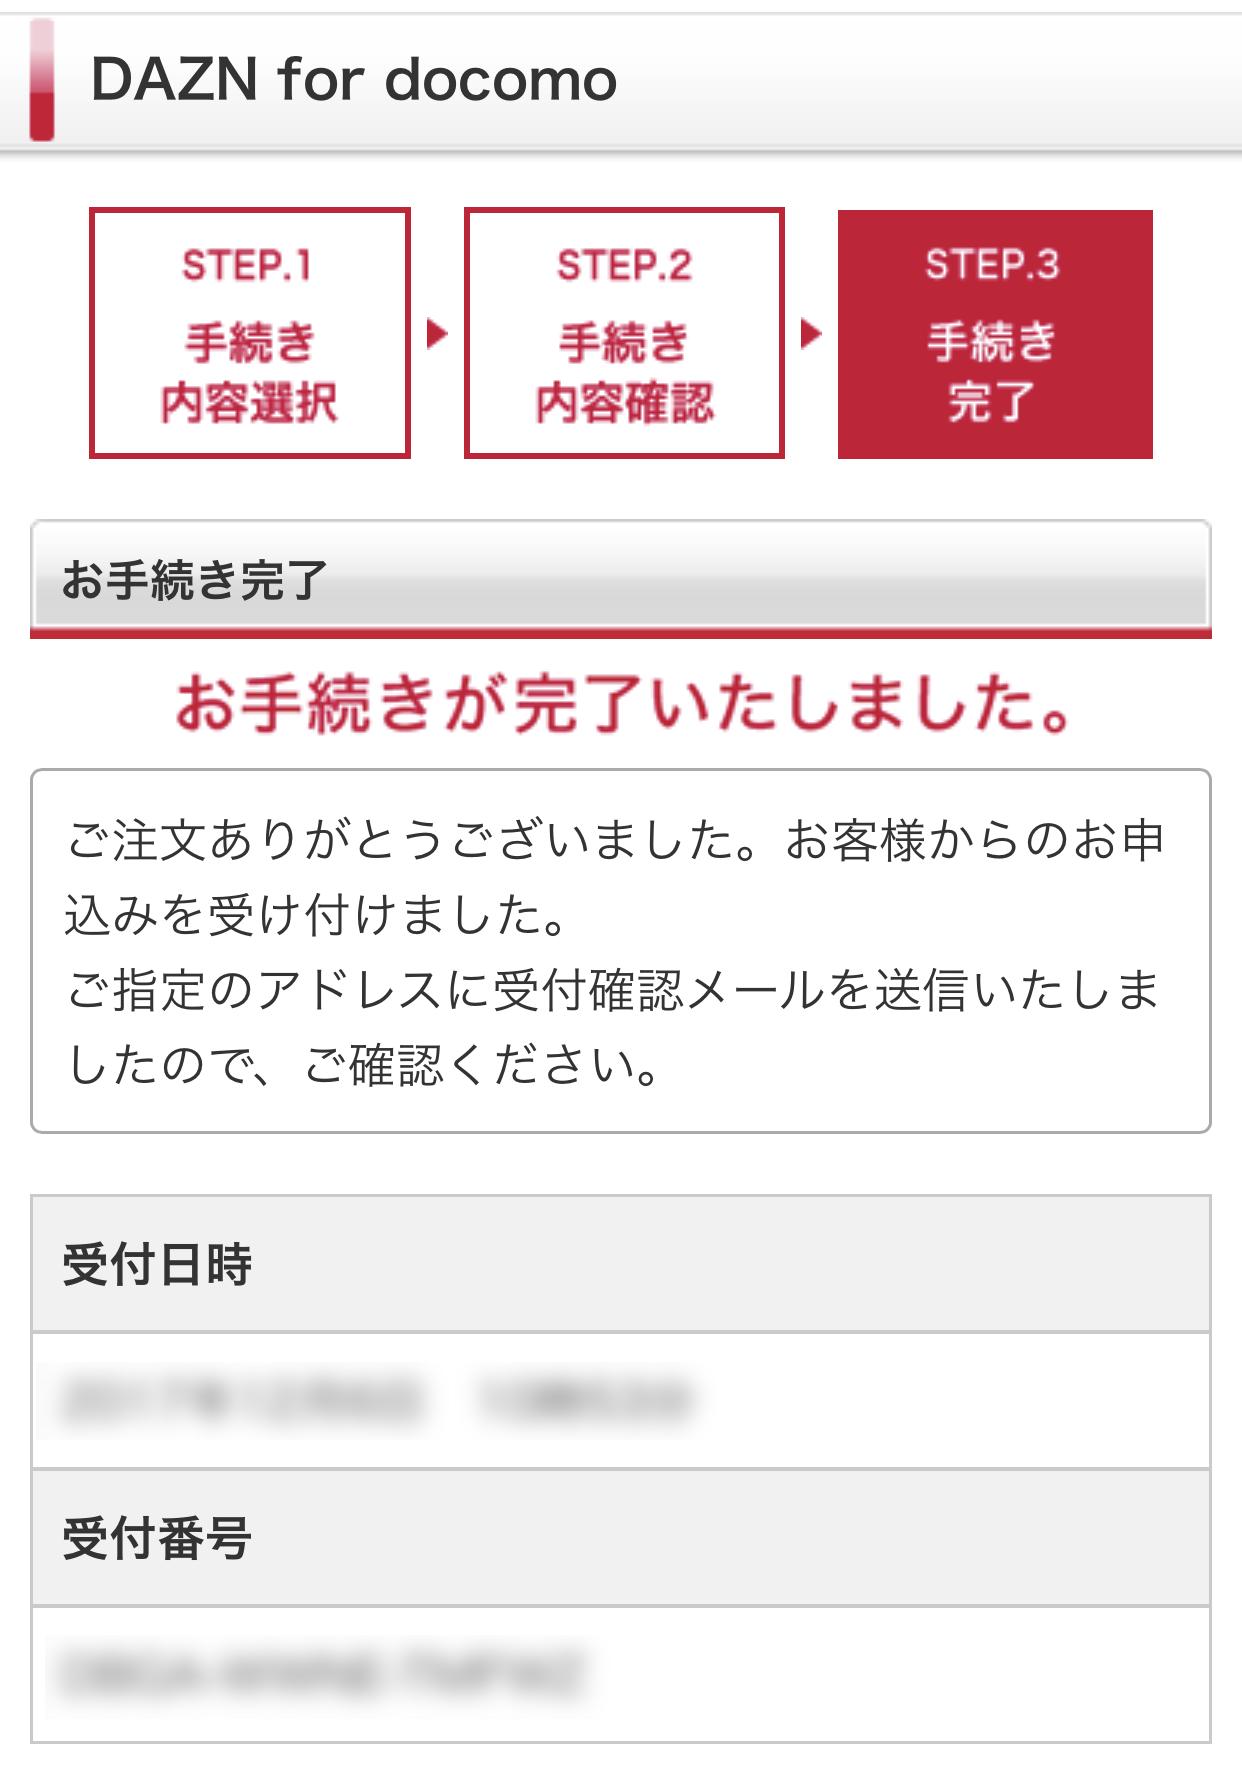 DAZN for docomo解約手続き完了メッセージを確認